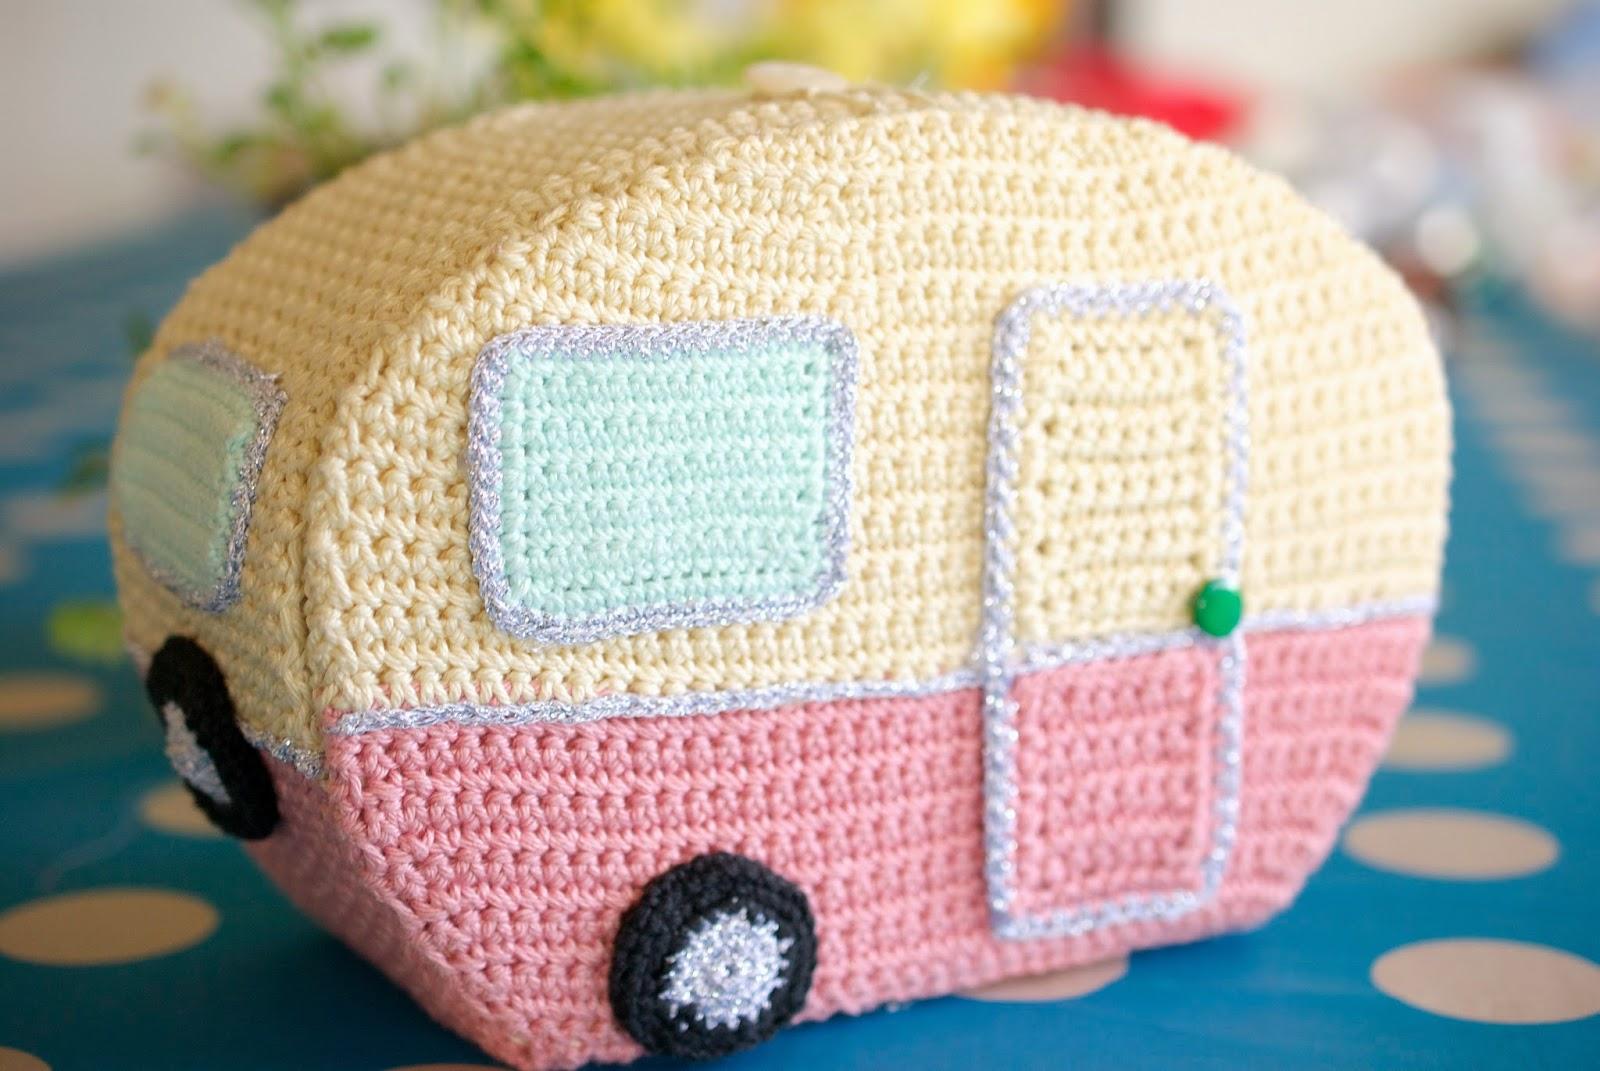 Caravan Knitting Pattern : Greedy For Colour: My Vintage, Crochet Caravan!